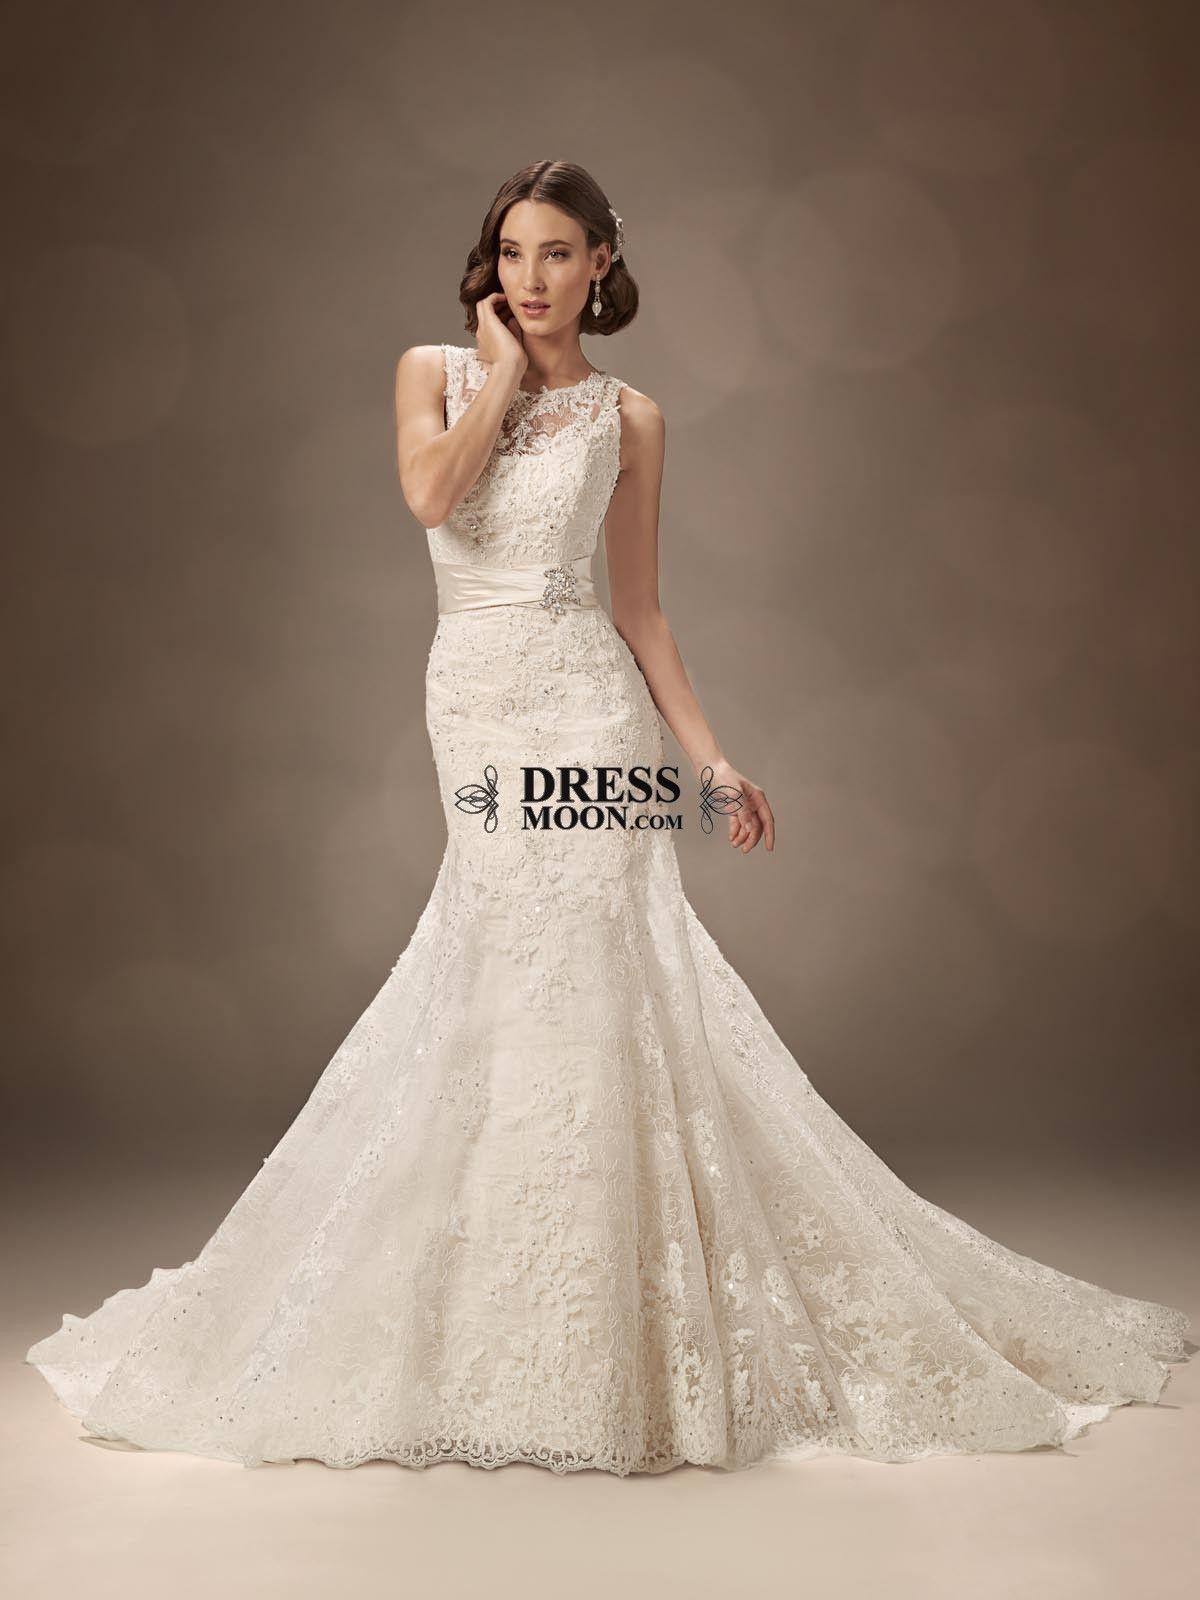 Satin with lace appliques chapel train mermaid wedding dress